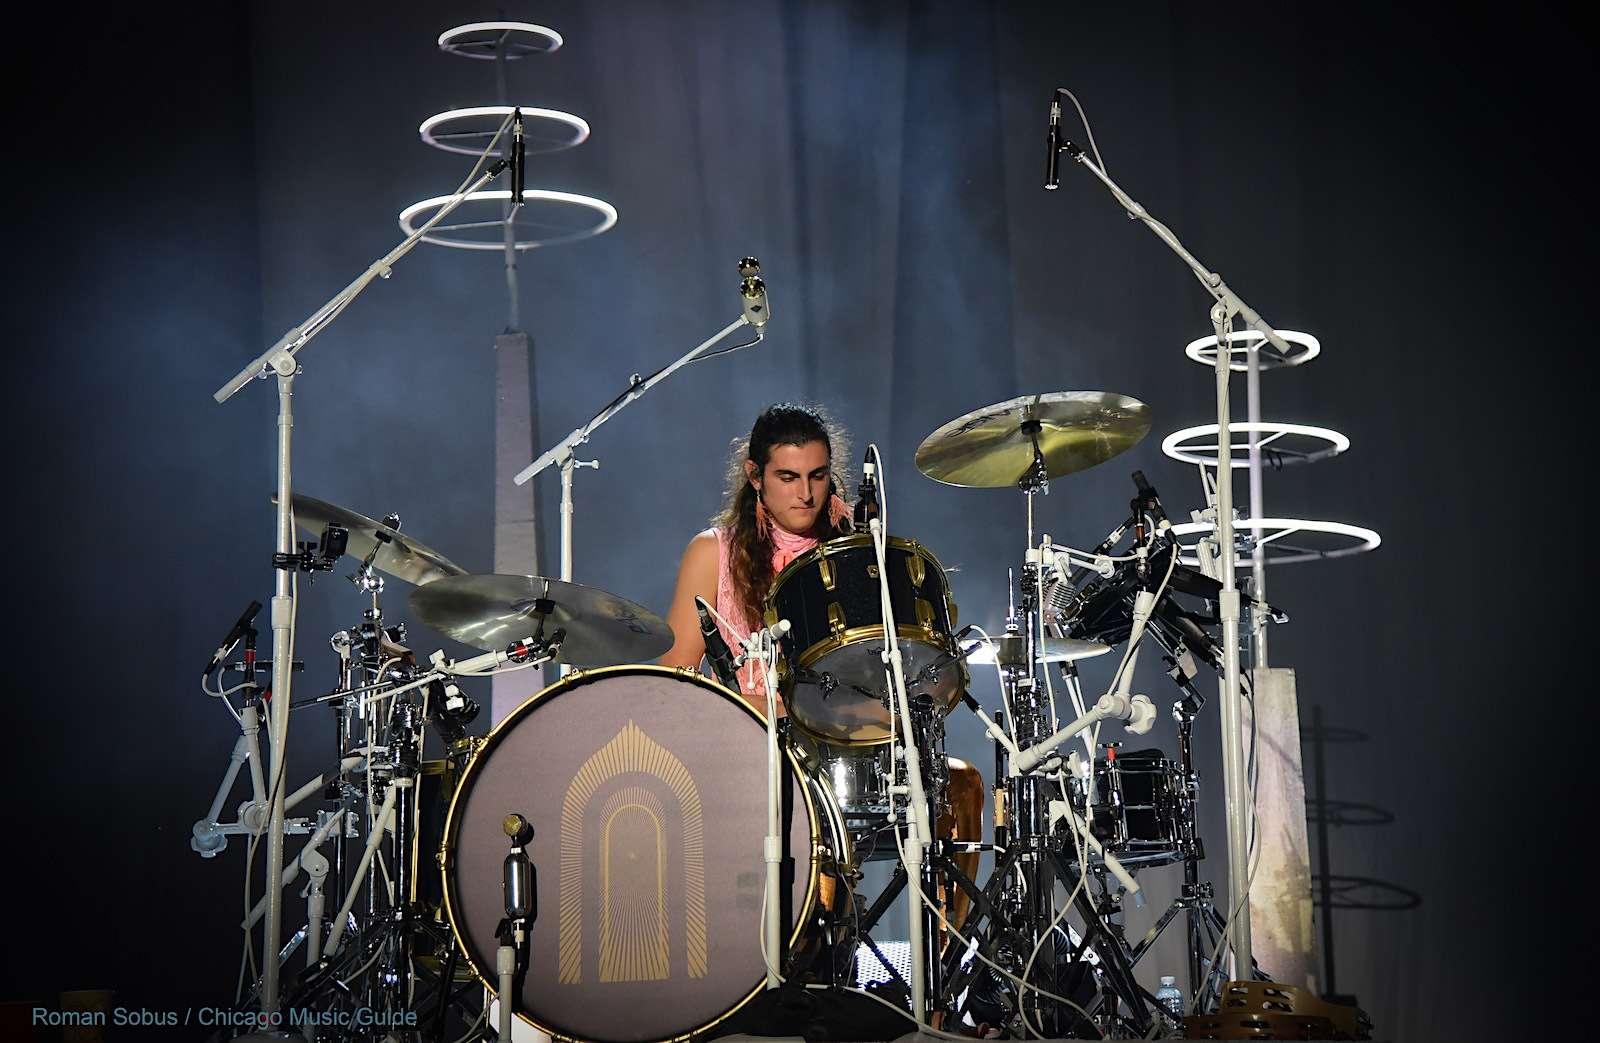 Greta Van Fleet Live at Huntington Bank Pavilion [GALLERY] 11